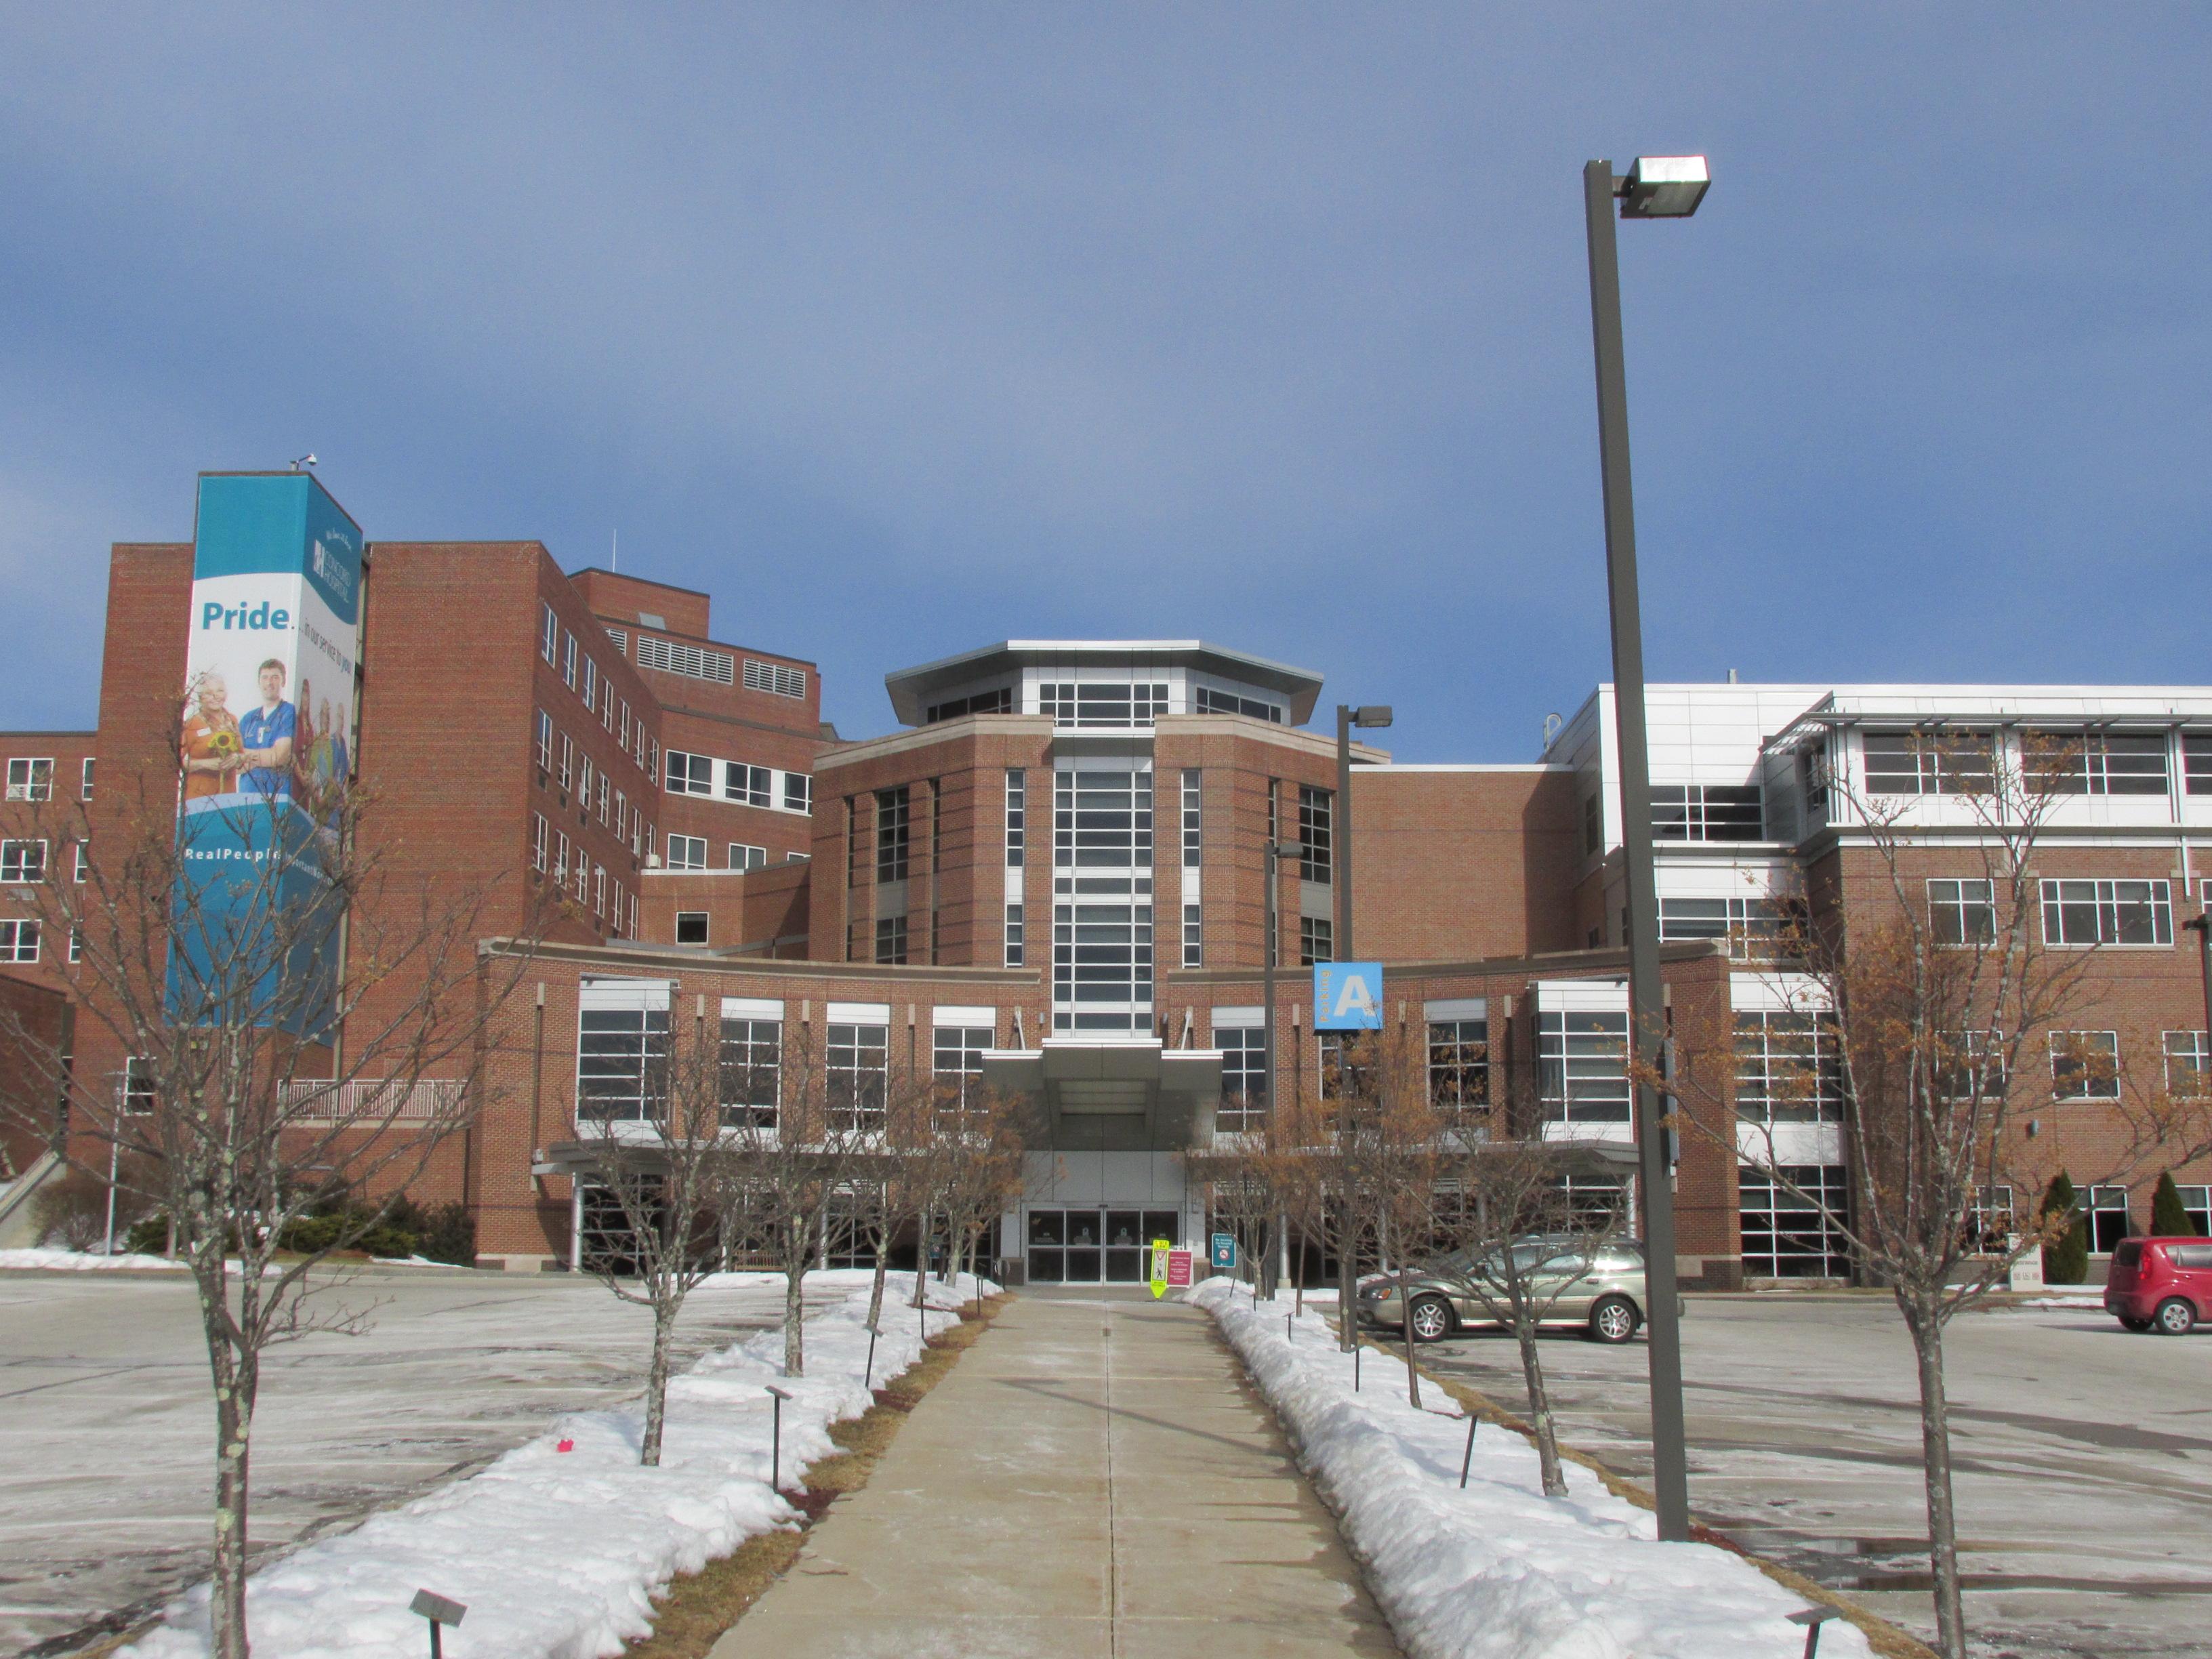 Nursing Organizational Chart In Hospital: Concord Hospital (New Hampshire) - Wikipedia,Chart